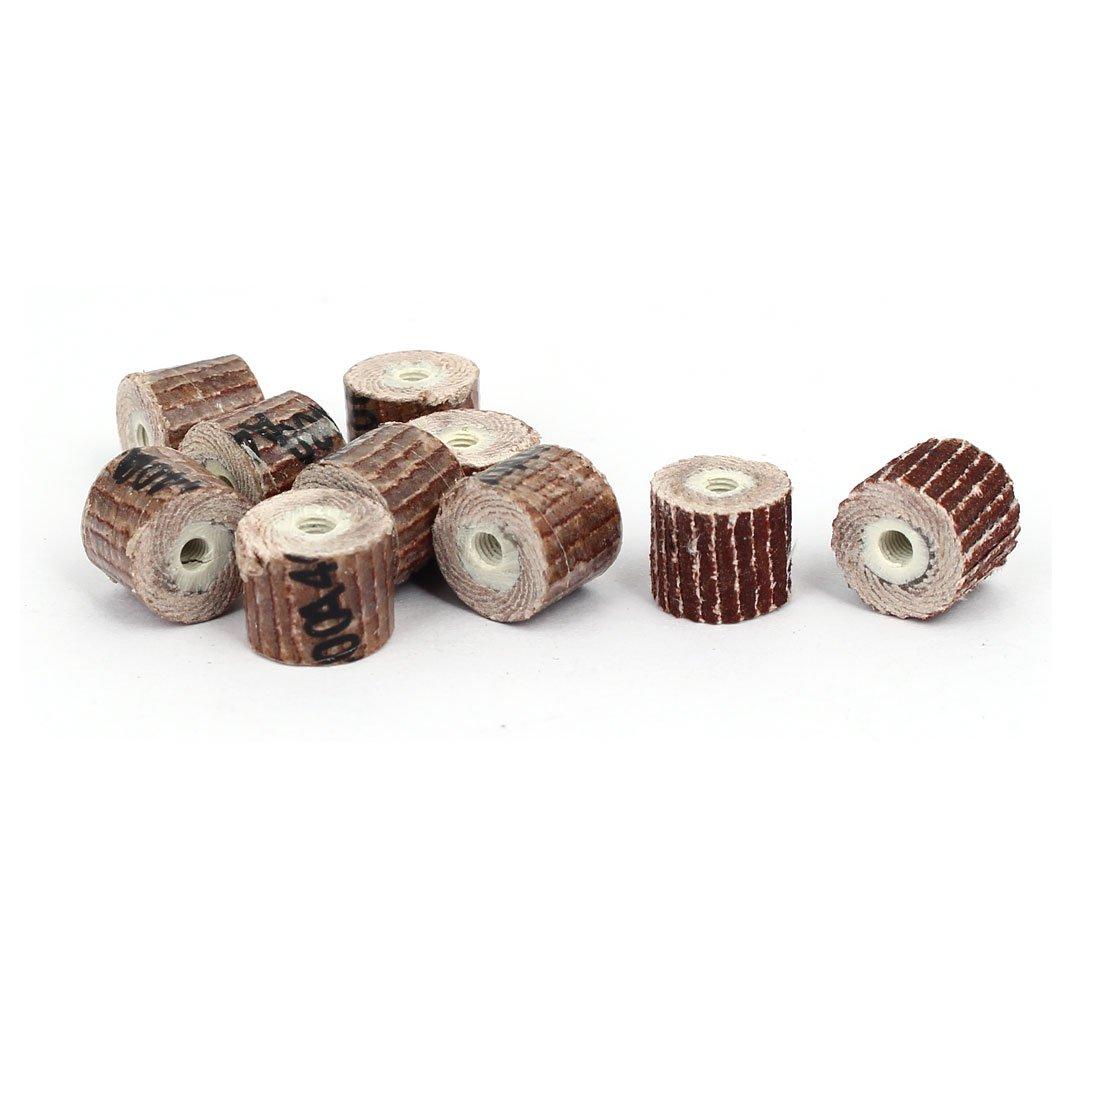 uxcell 400 Grit 10mm Dia Sandpaper Flap Sanding Wheel Grinding Polishing Tool 10pcs